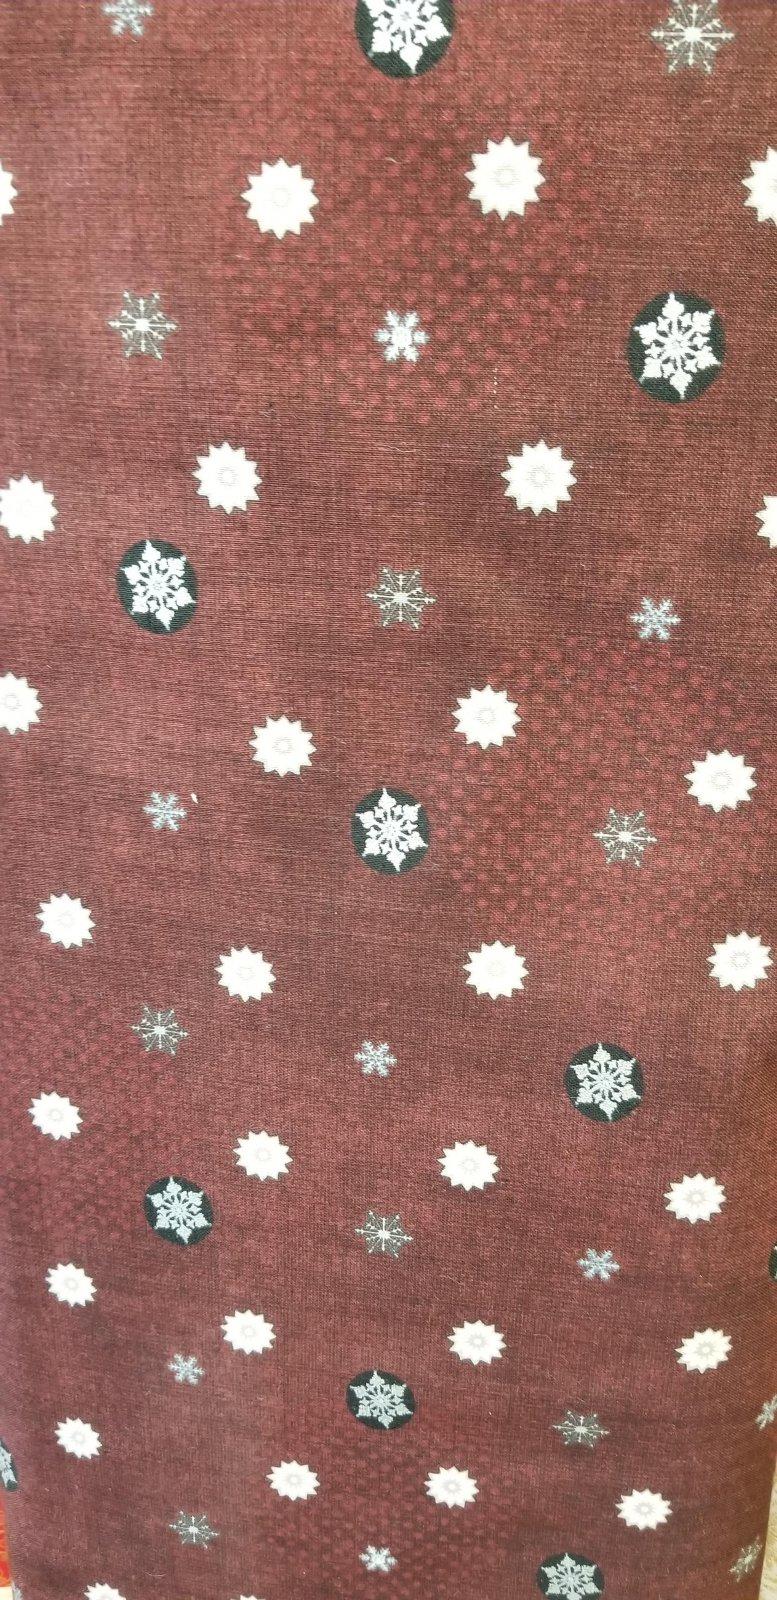 045945182176 Icy Winter small stars